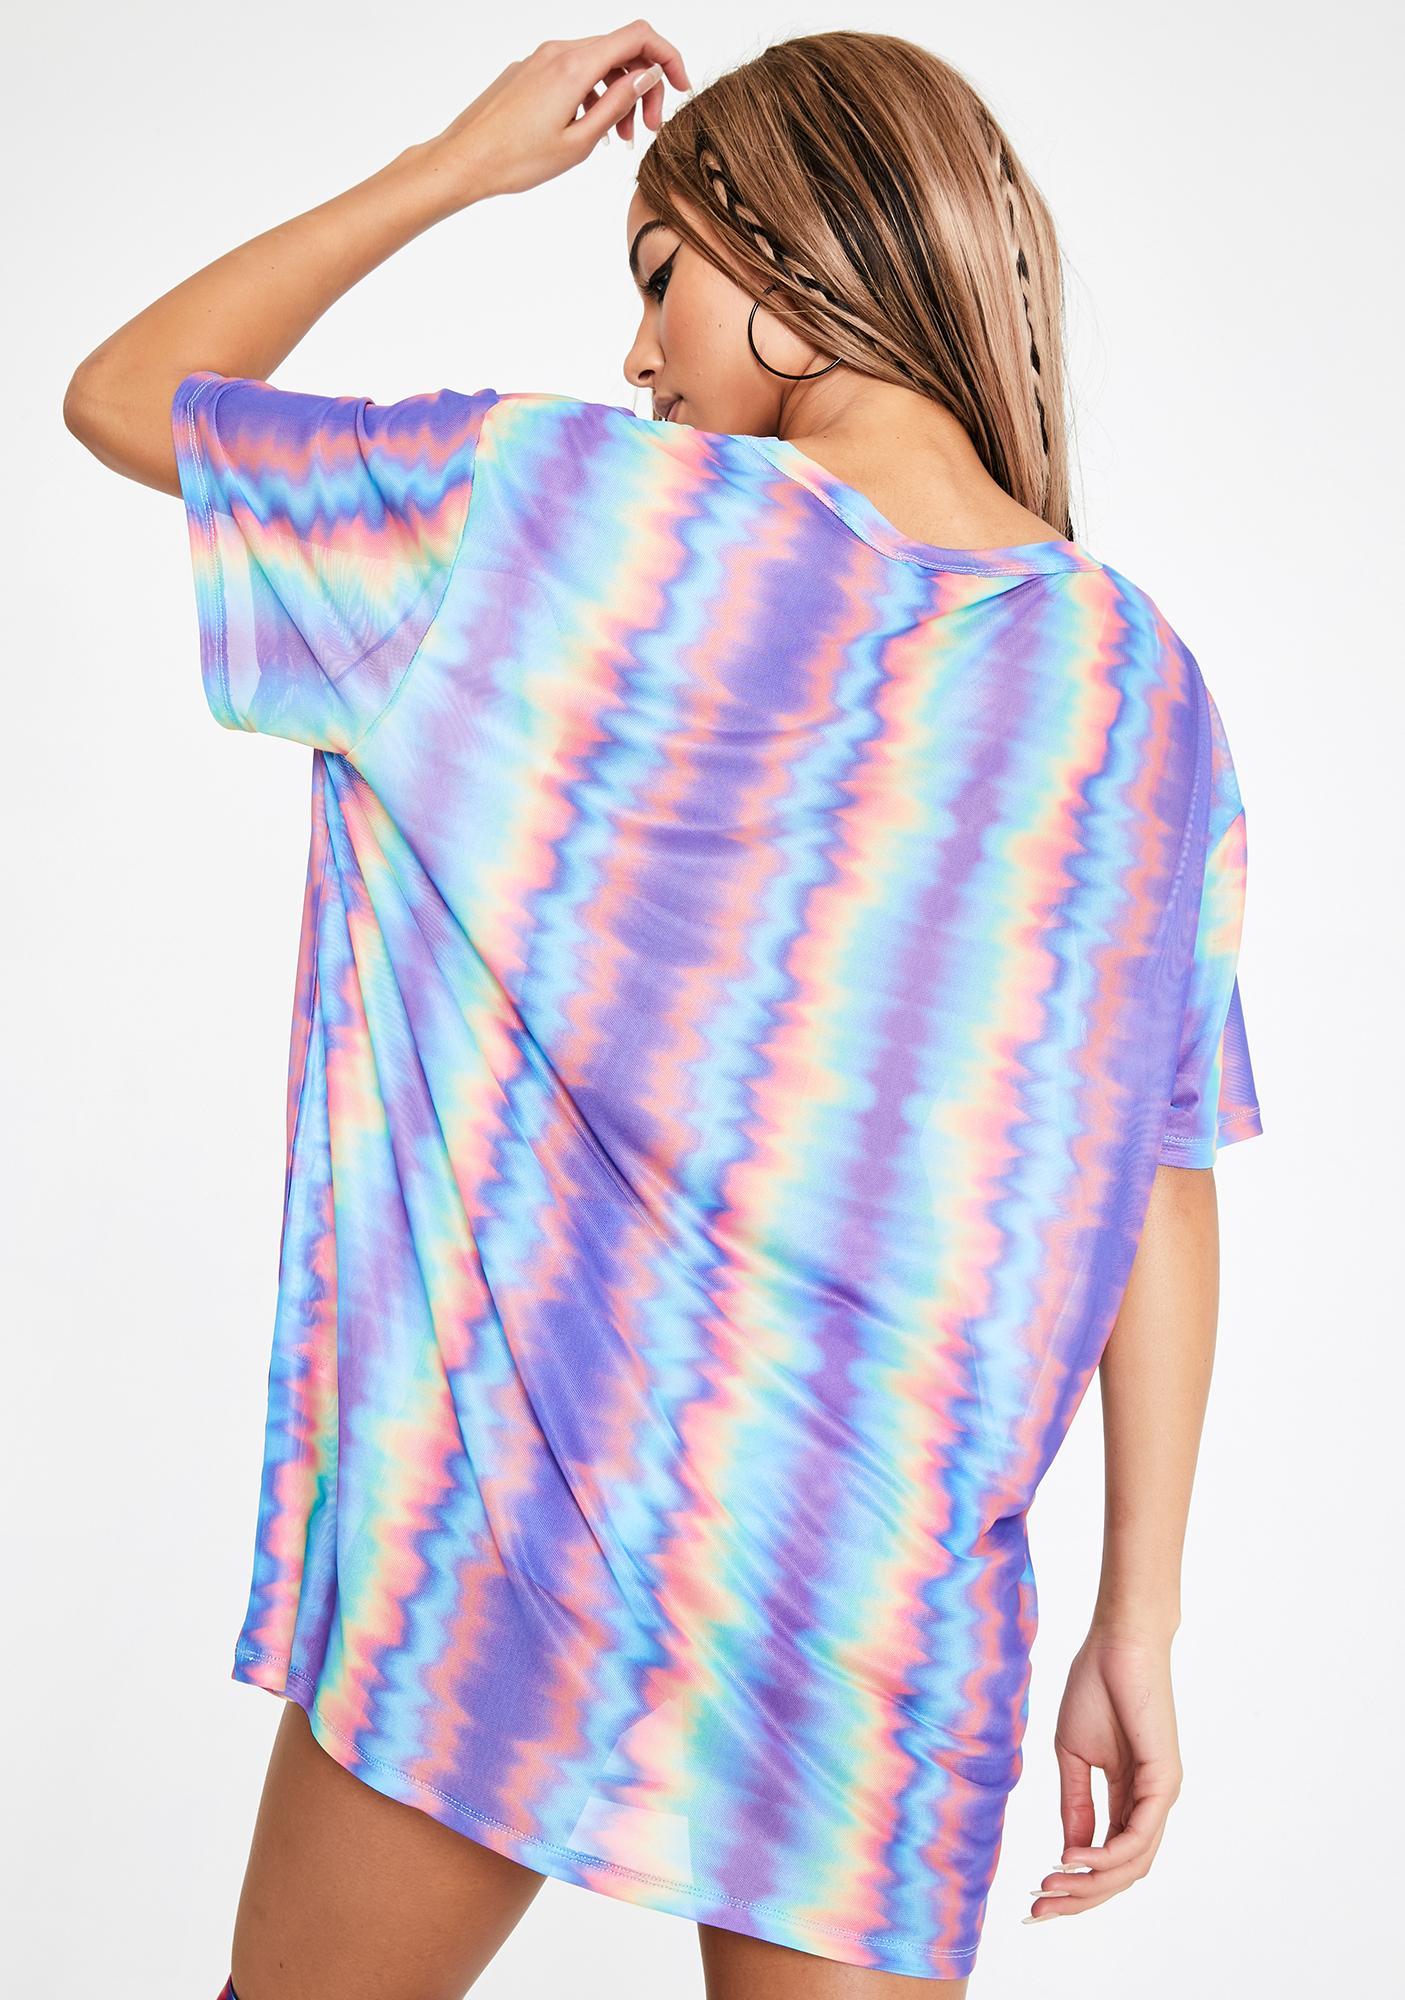 Club Exx Hypnotic Mist Mesh Tee Dress